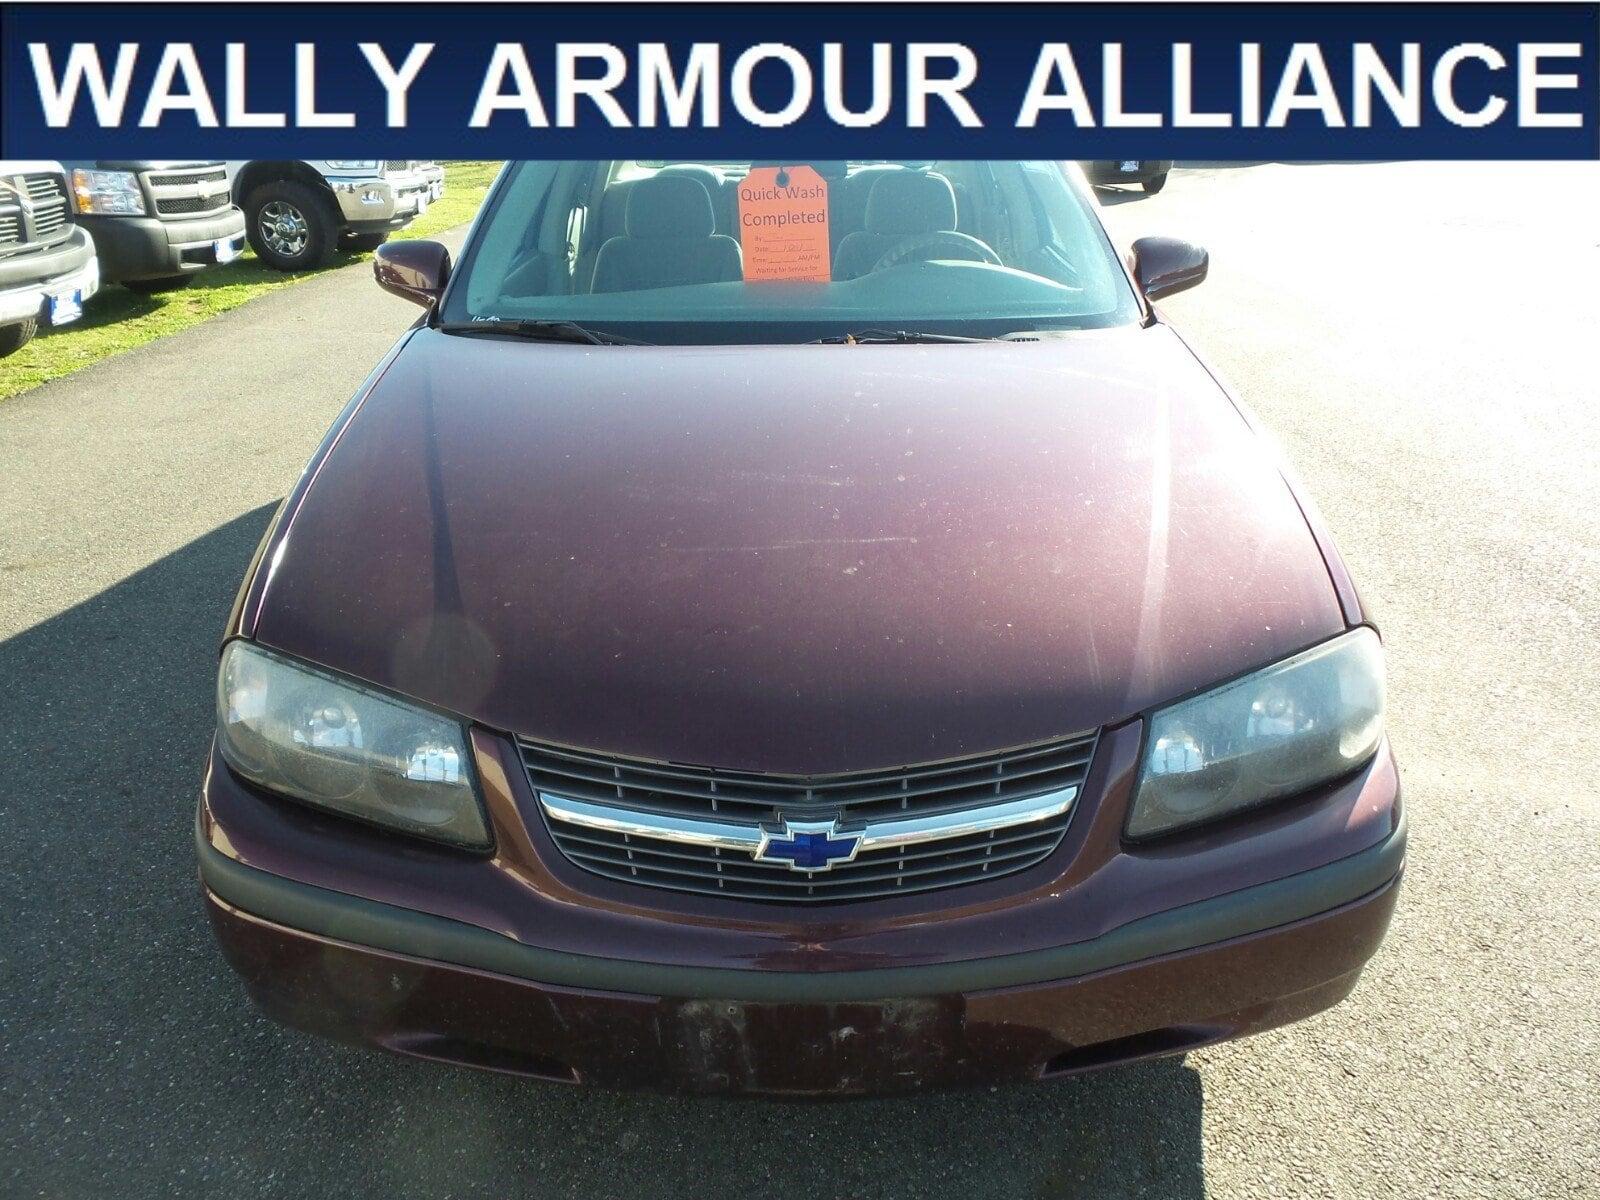 2004 Chevrolet Impala in Alliance